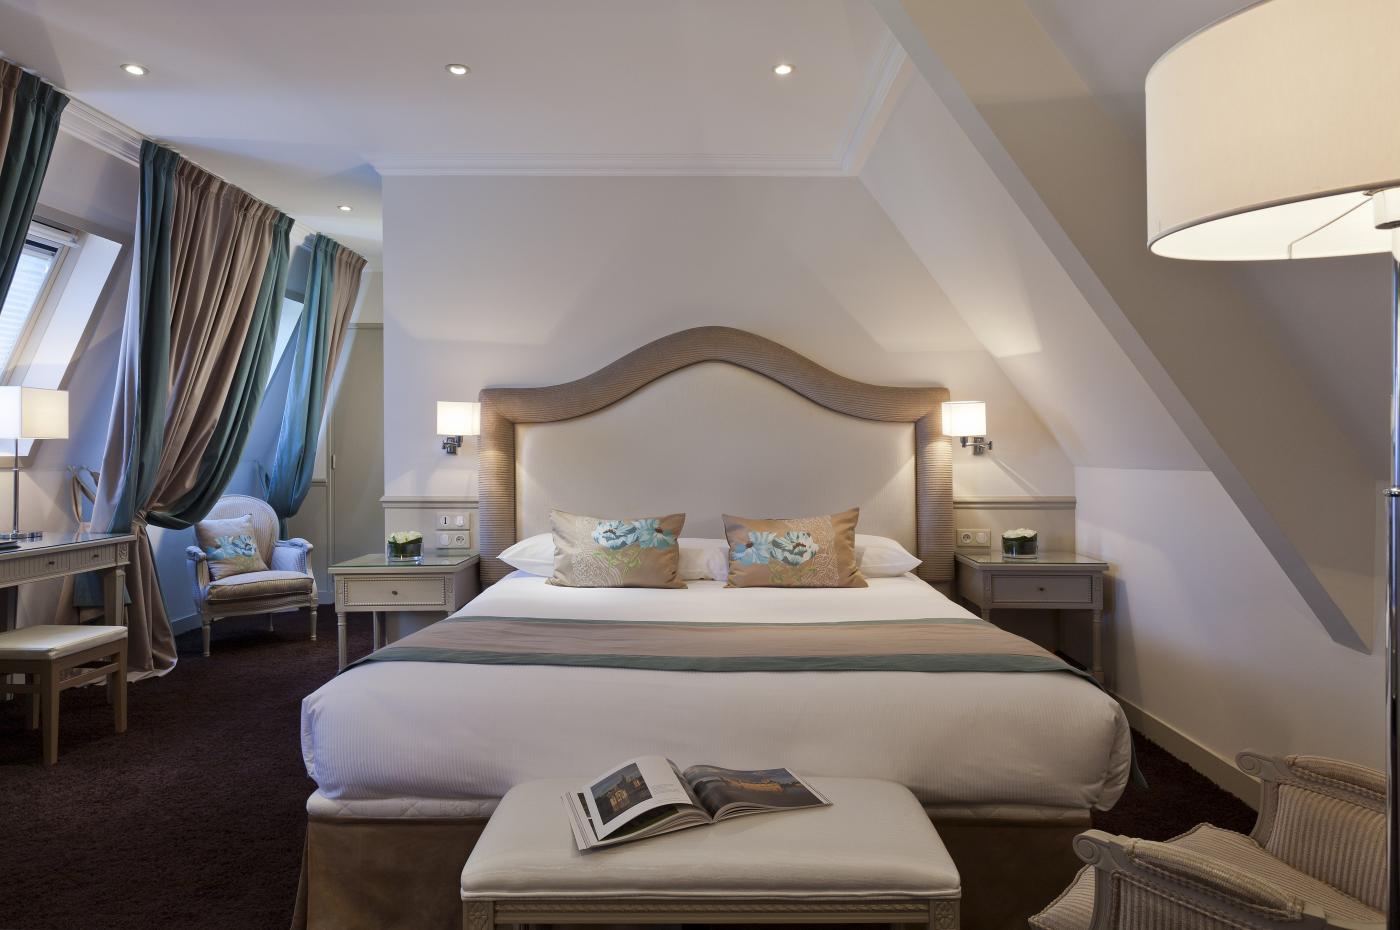 montvillargenne-120-chambres-de-grand-confort